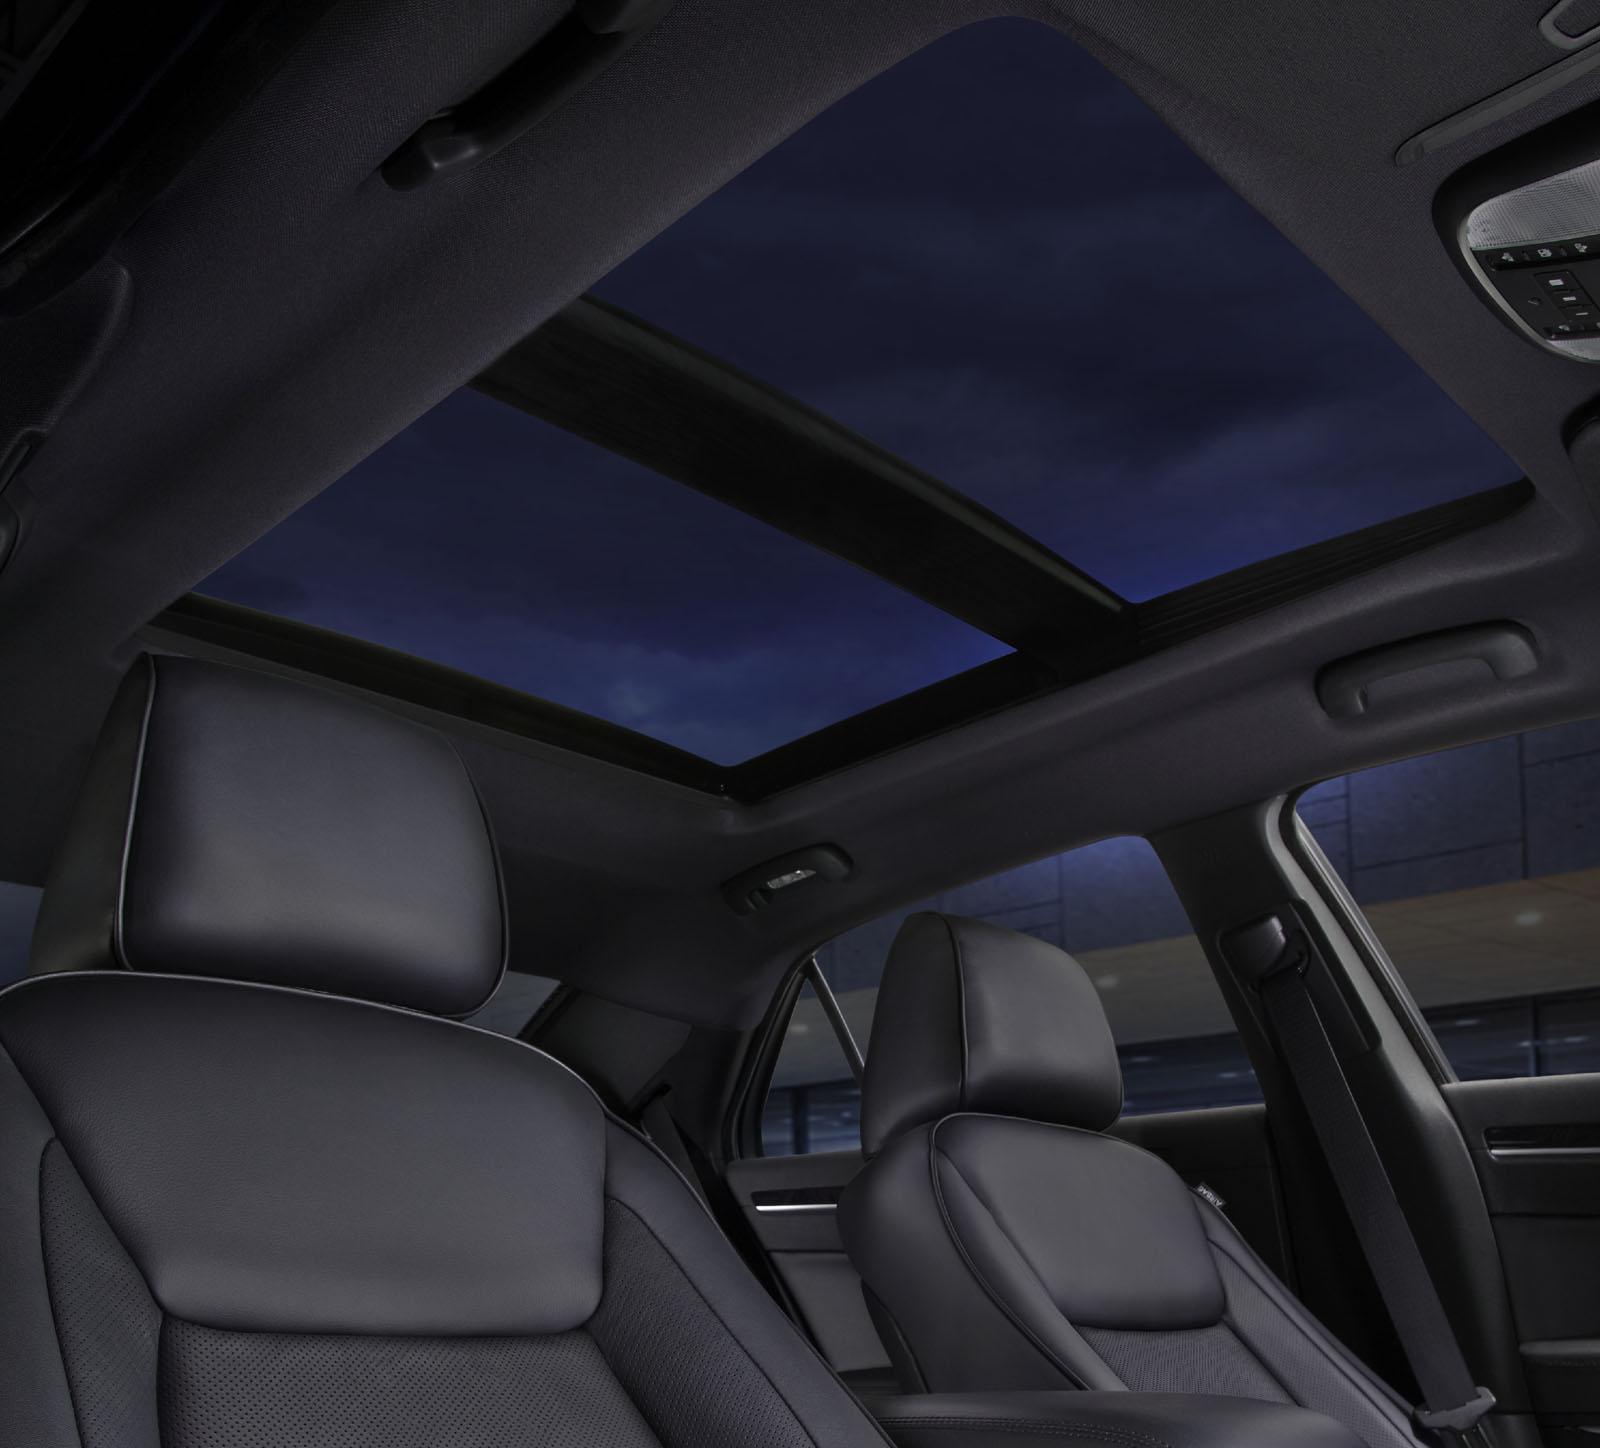 2012 Chrysler 300 Luxury Series 4k Hd Wallpaper: Liberty Walk Dodge Challenger Hellcat By SR Auto Is Hell